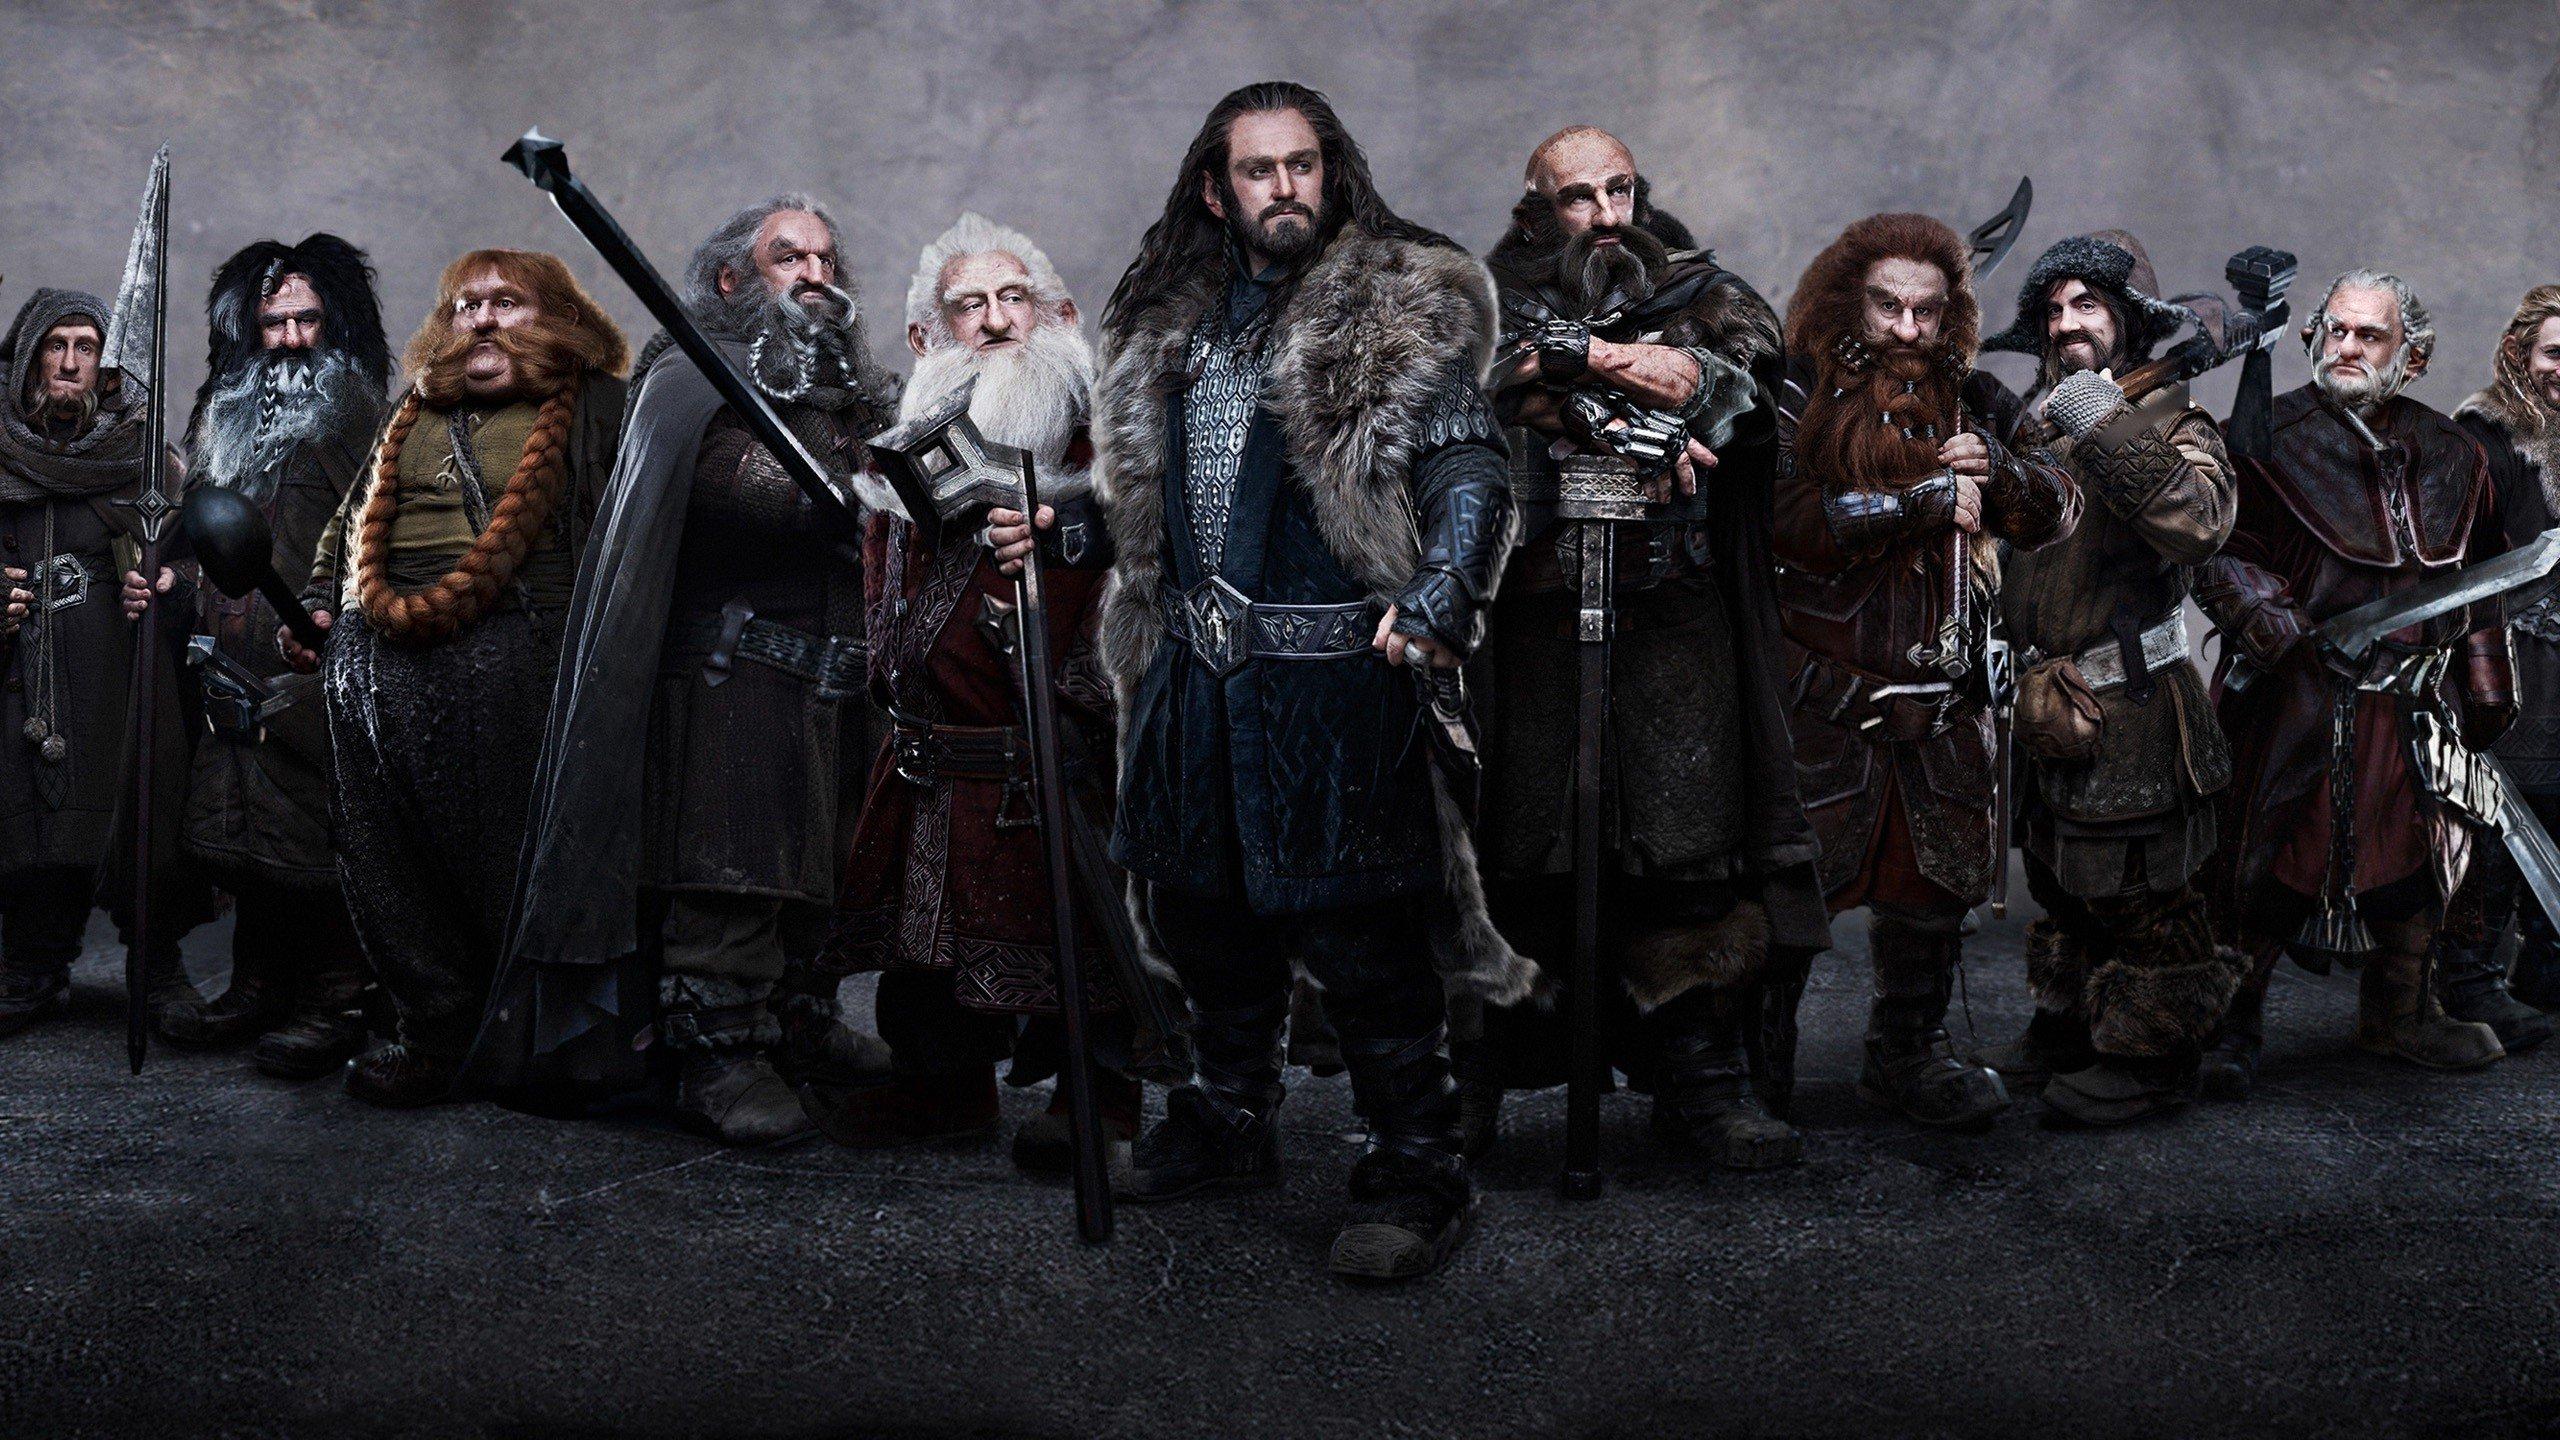 'No Shave November' Hobbit Dwarf Cheat Sheet [Image]